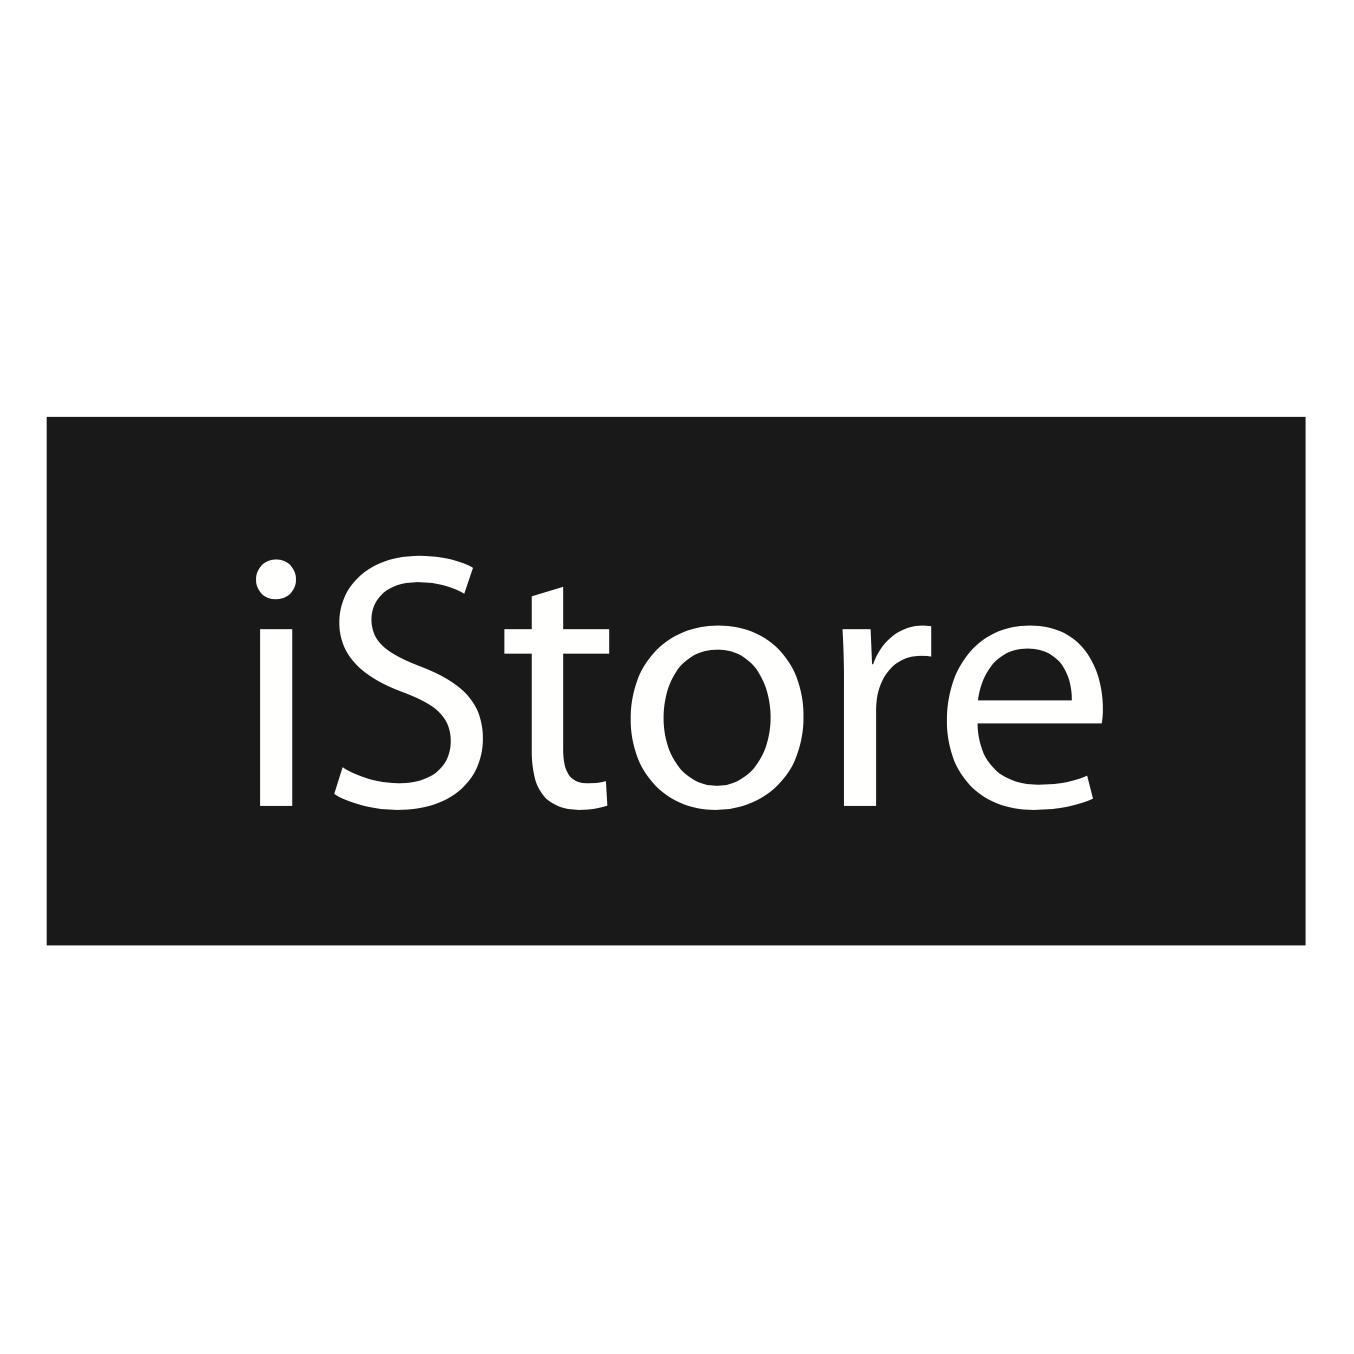 iPhone 7 Plus 128GB - Silver